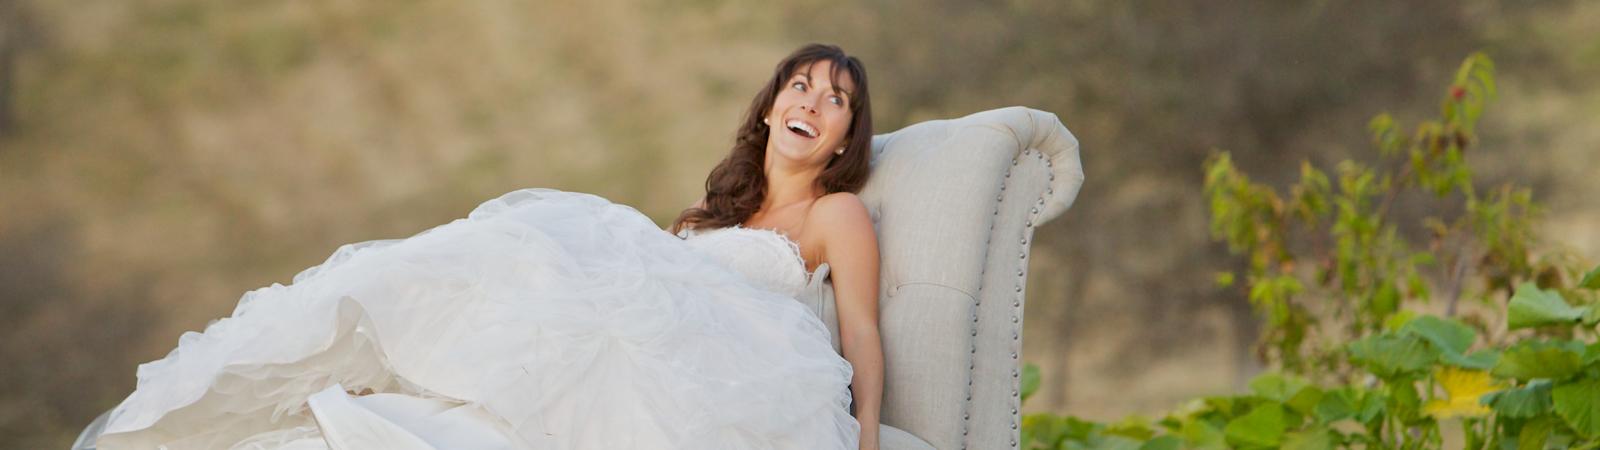 Carmel Valley Ranch_Lifestyle_Weddings_bride on chaise in organic garden